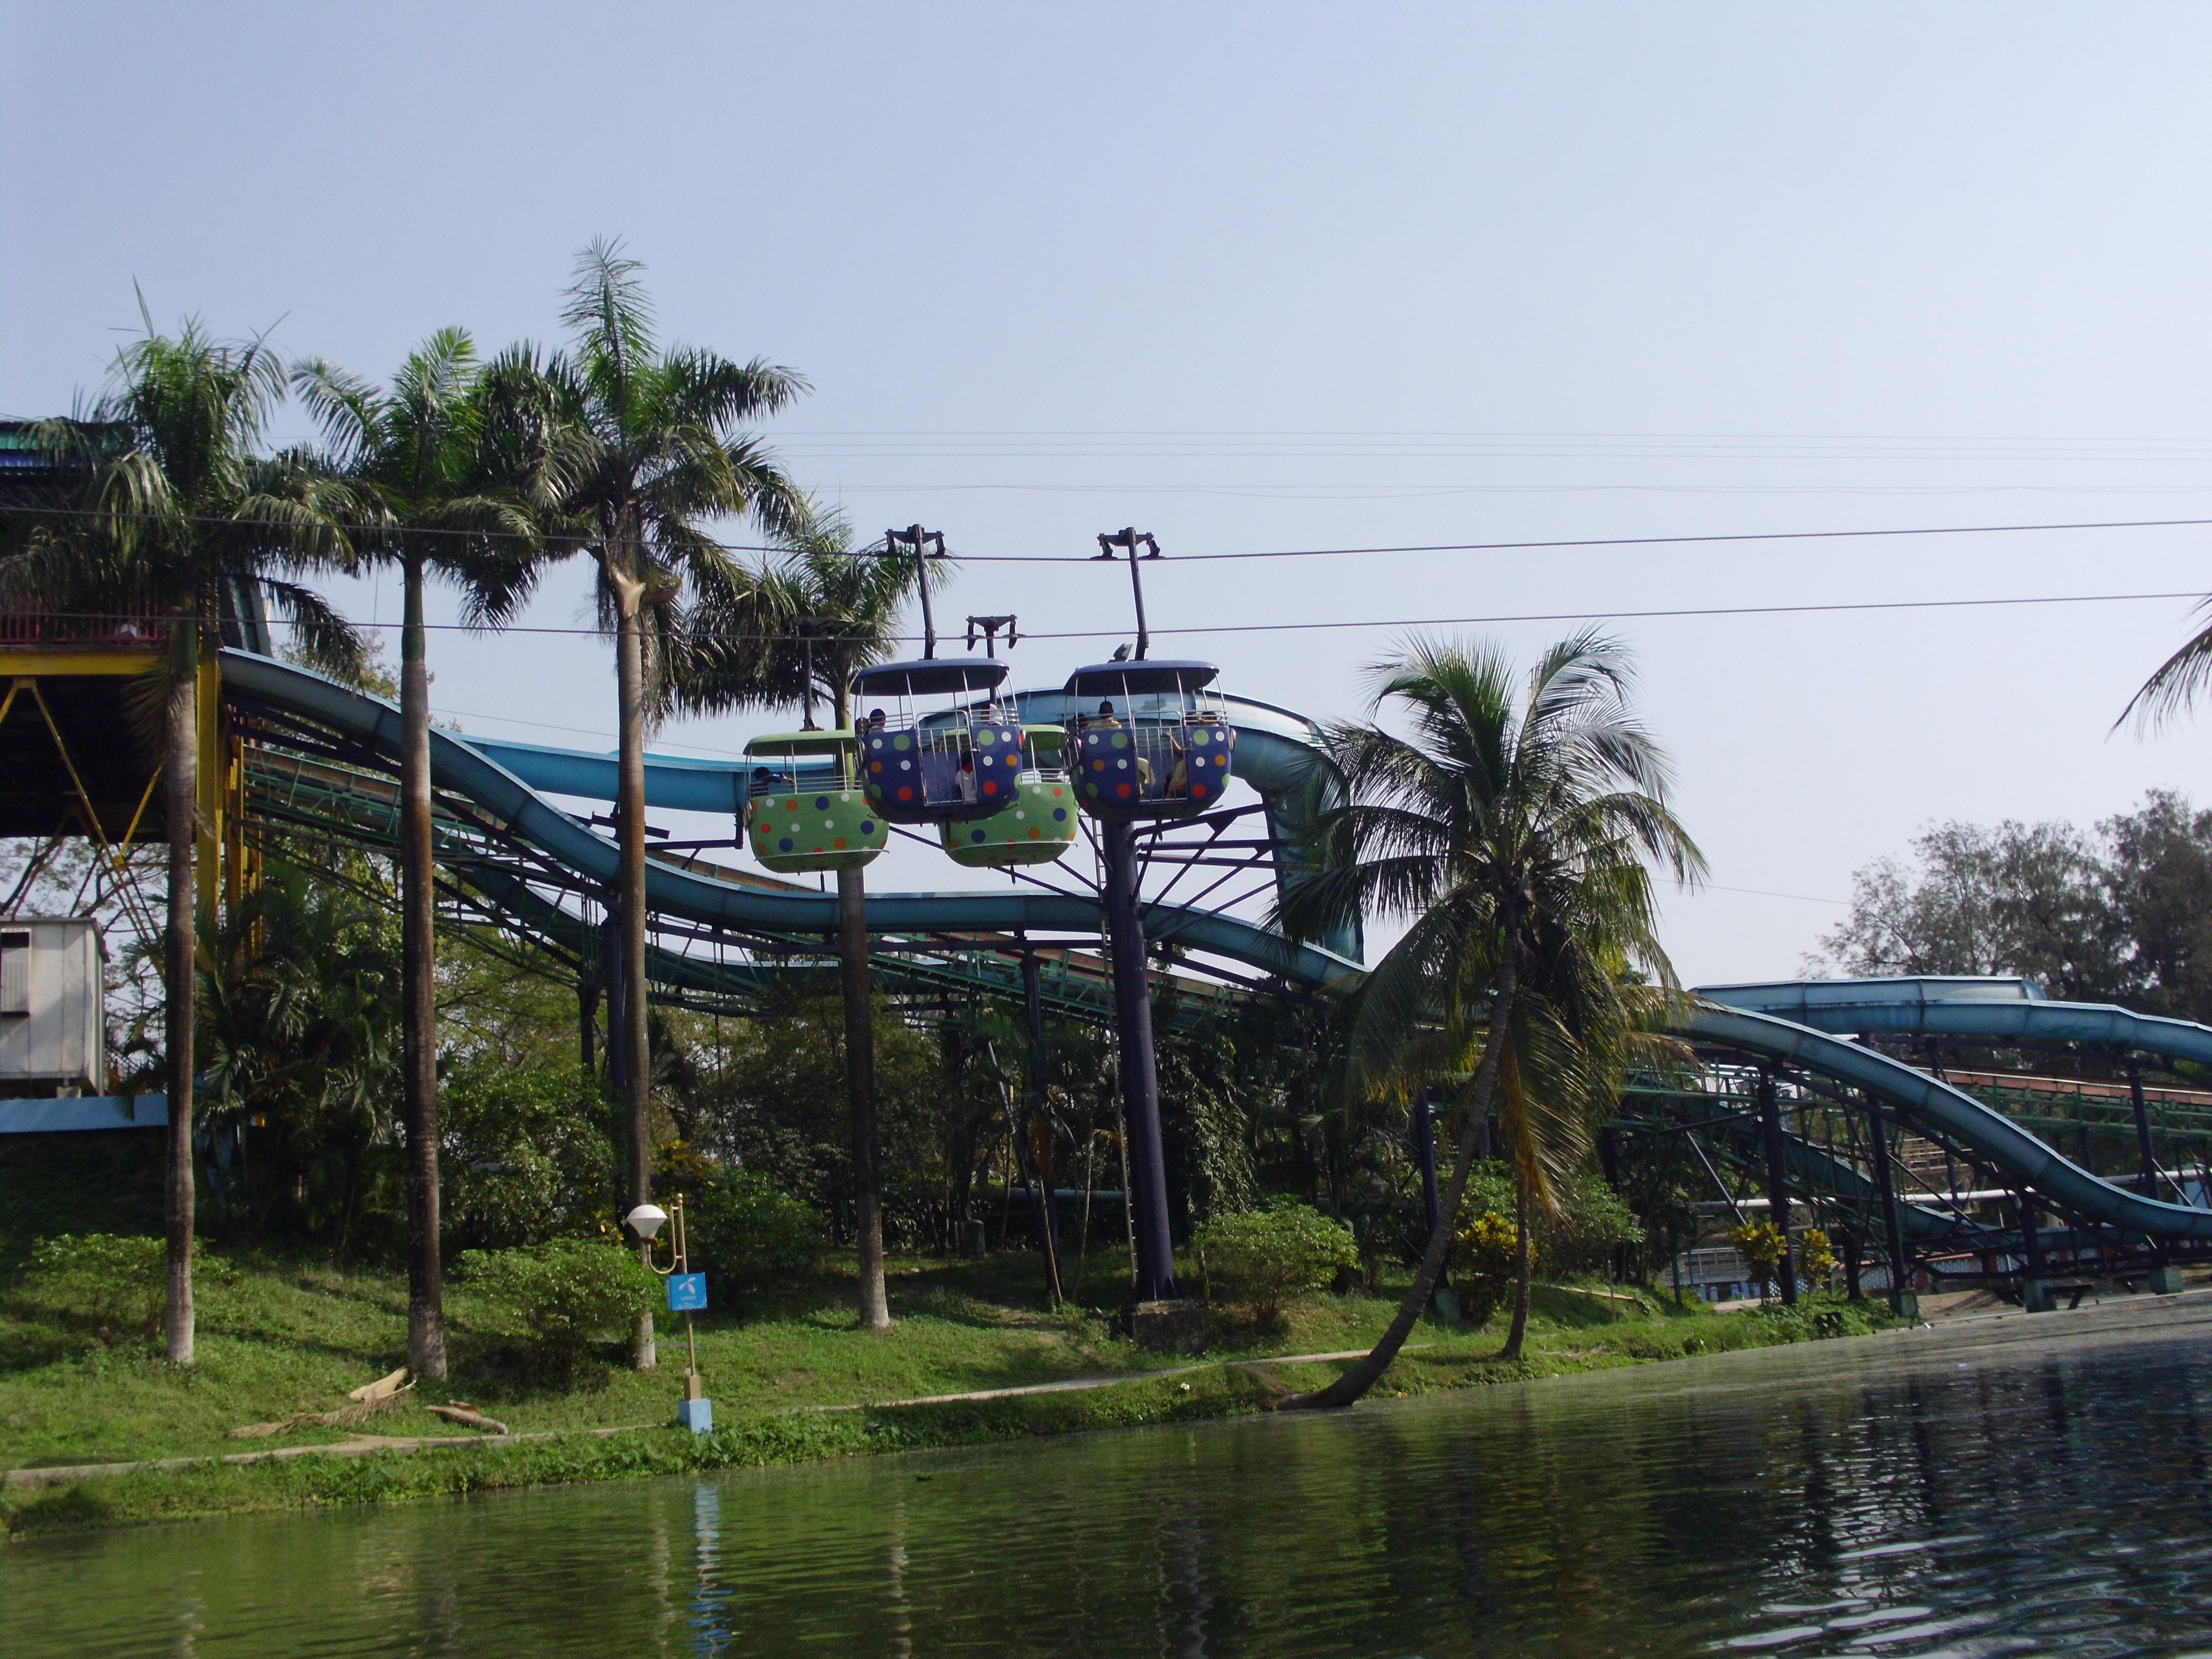 Neeladri Amusement Water Park